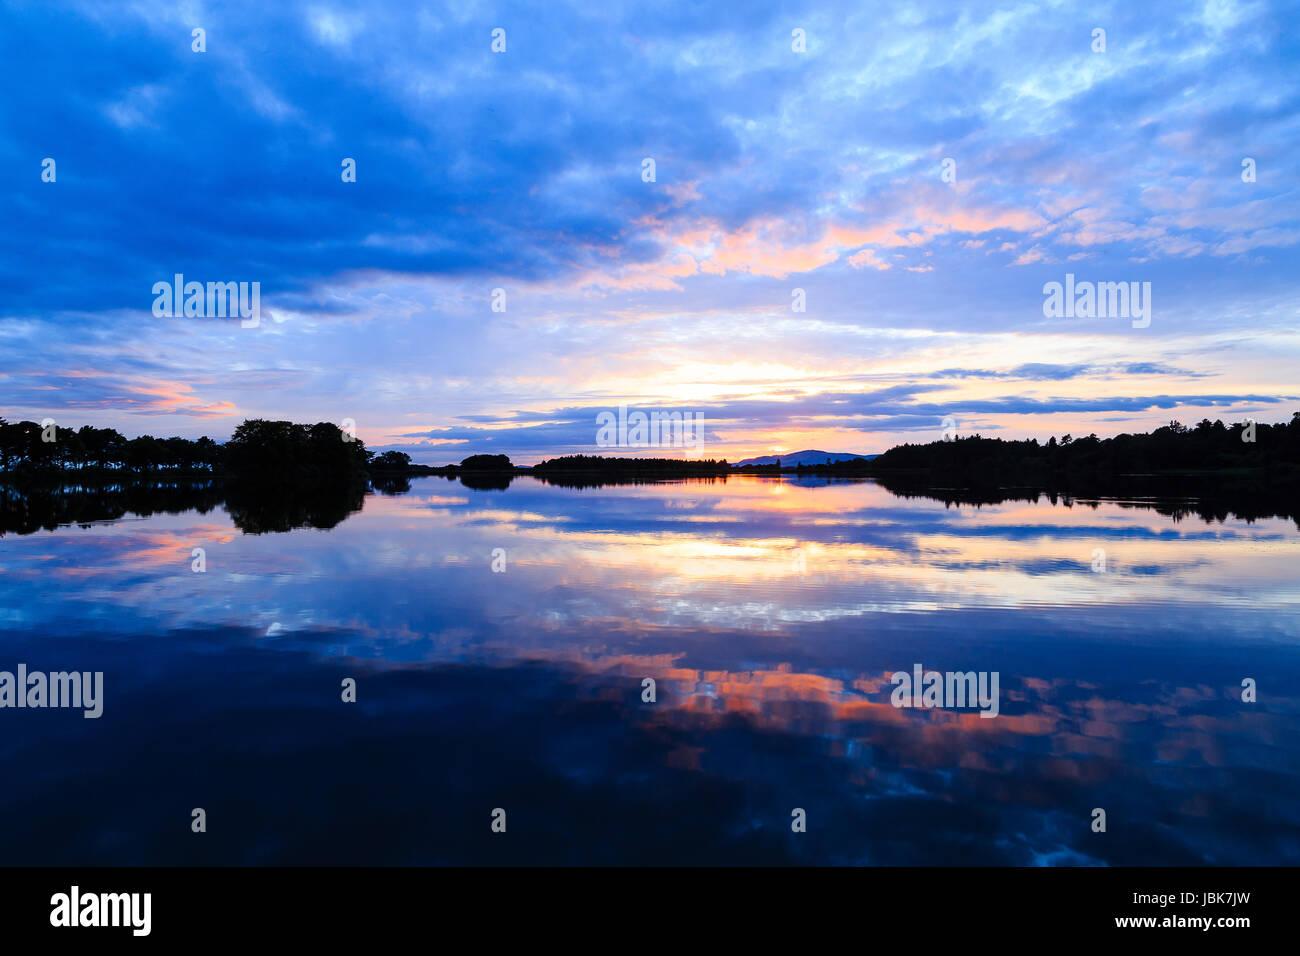 Sunset at Monikie Reservoir, Angus - Stock Image